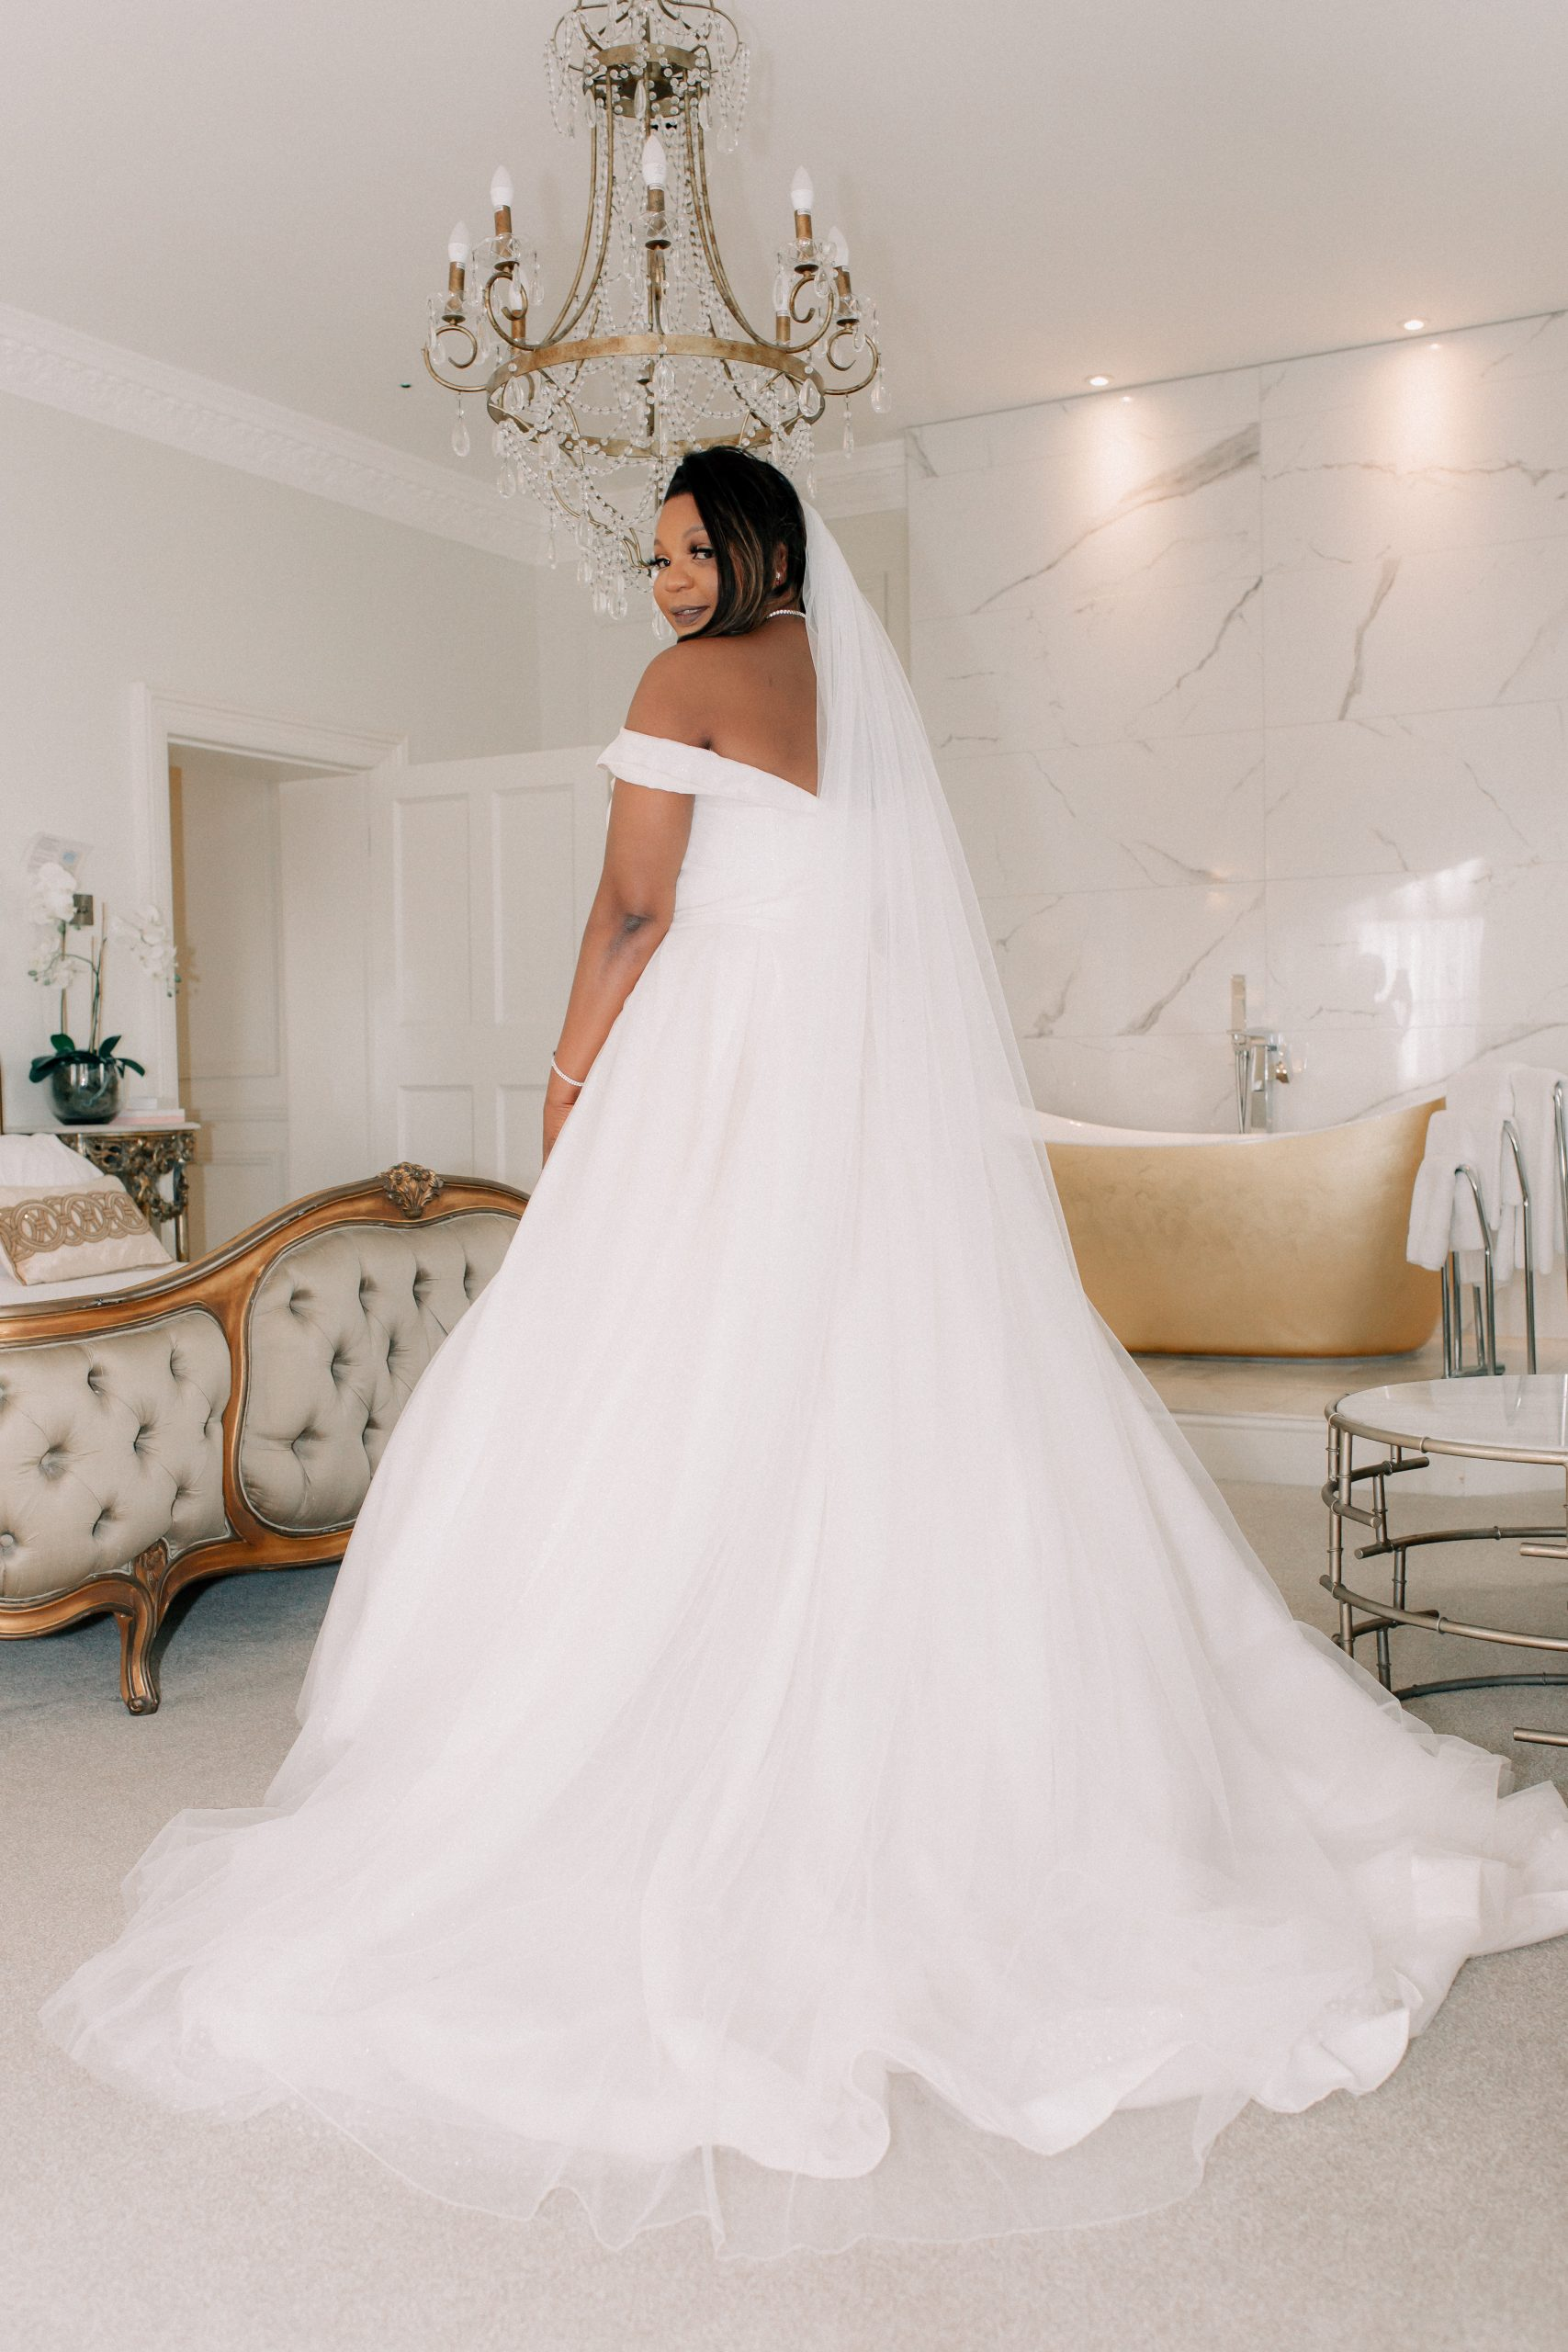 Gamu - Bridal Suit Winstanley House - Emma Lowe Photography 2021